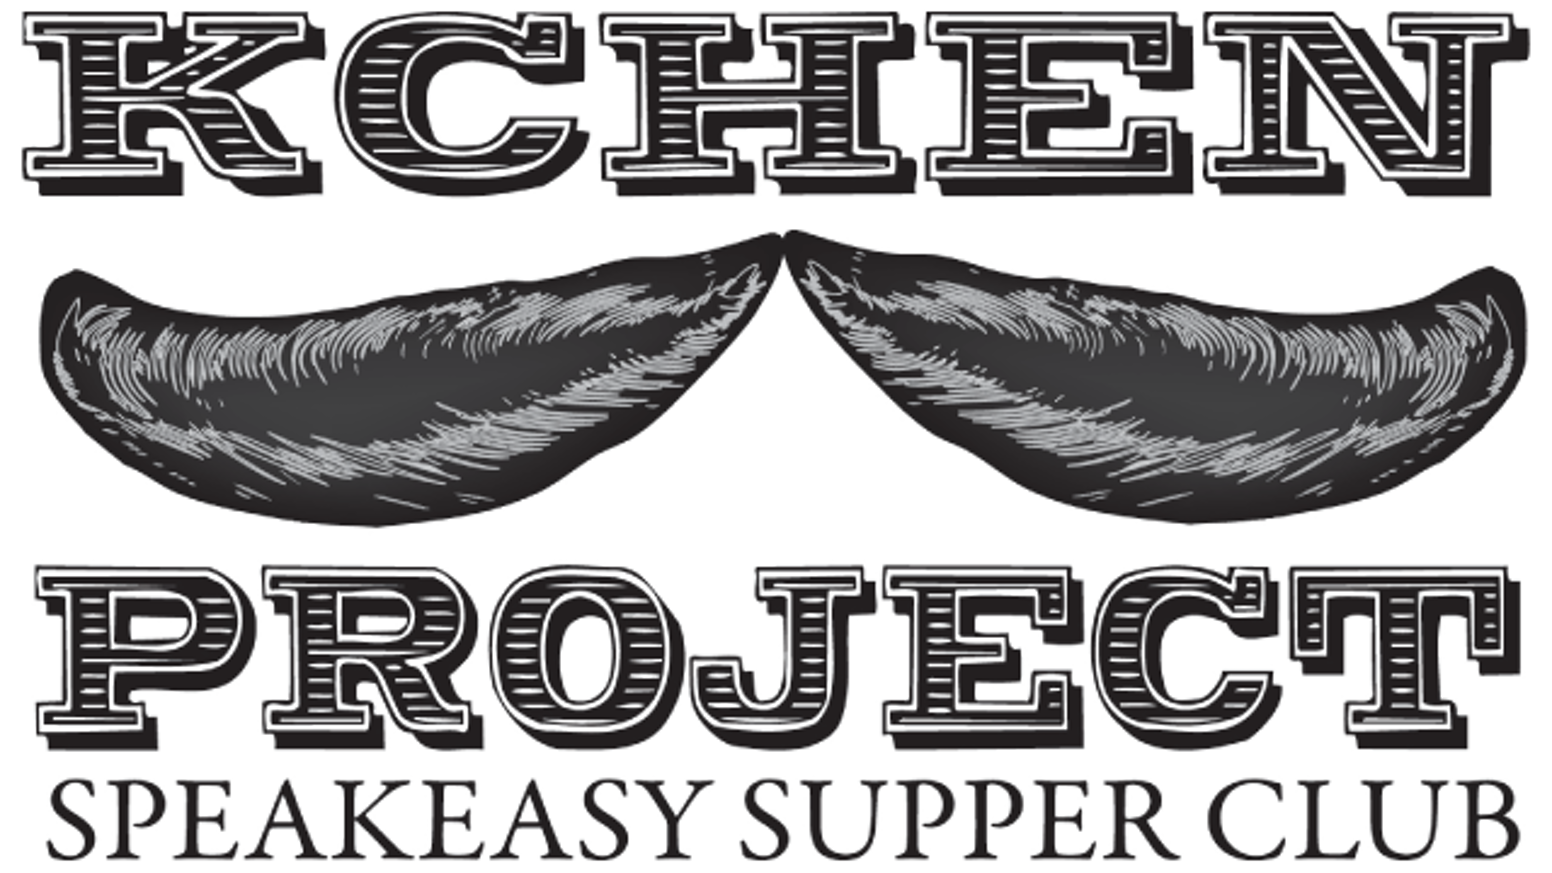 kchen project speakeasy style supper club in santa barbara